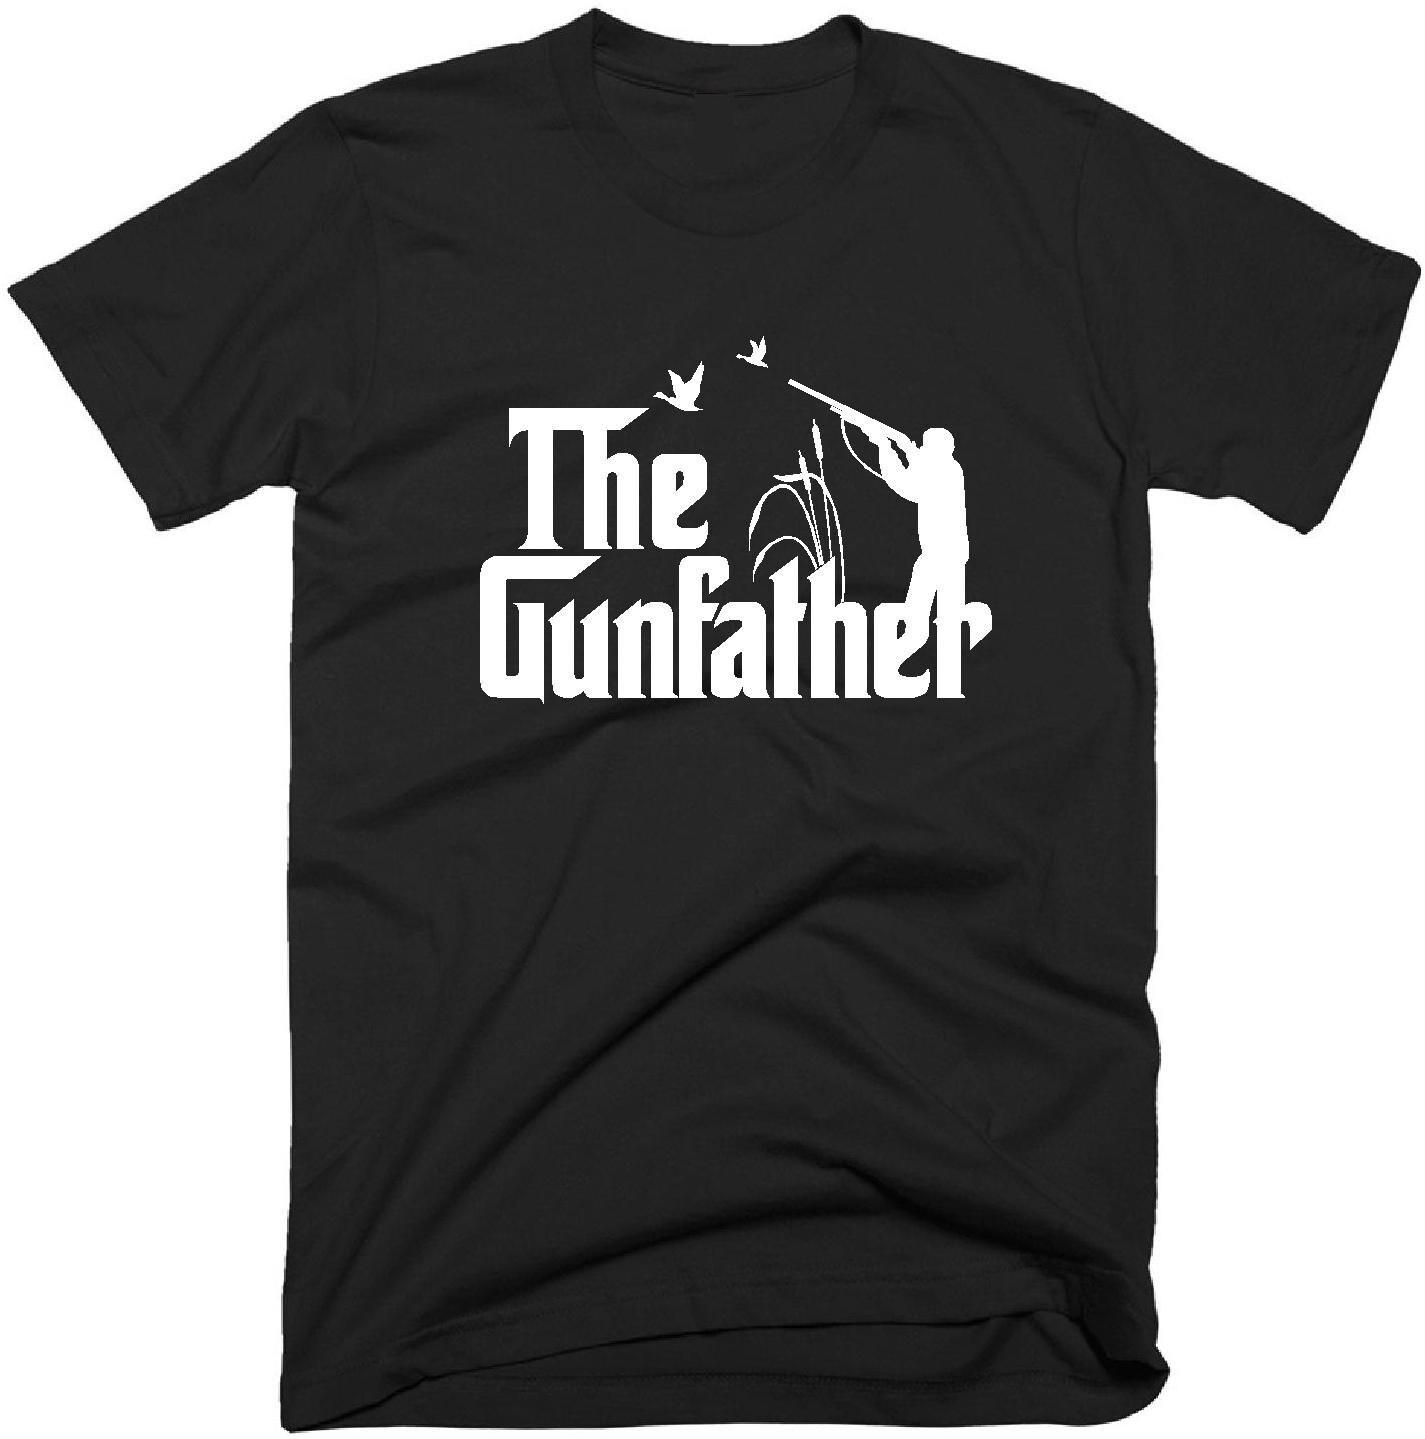 The Gunfather TShirt Hunting Shooting Tee Shirt.